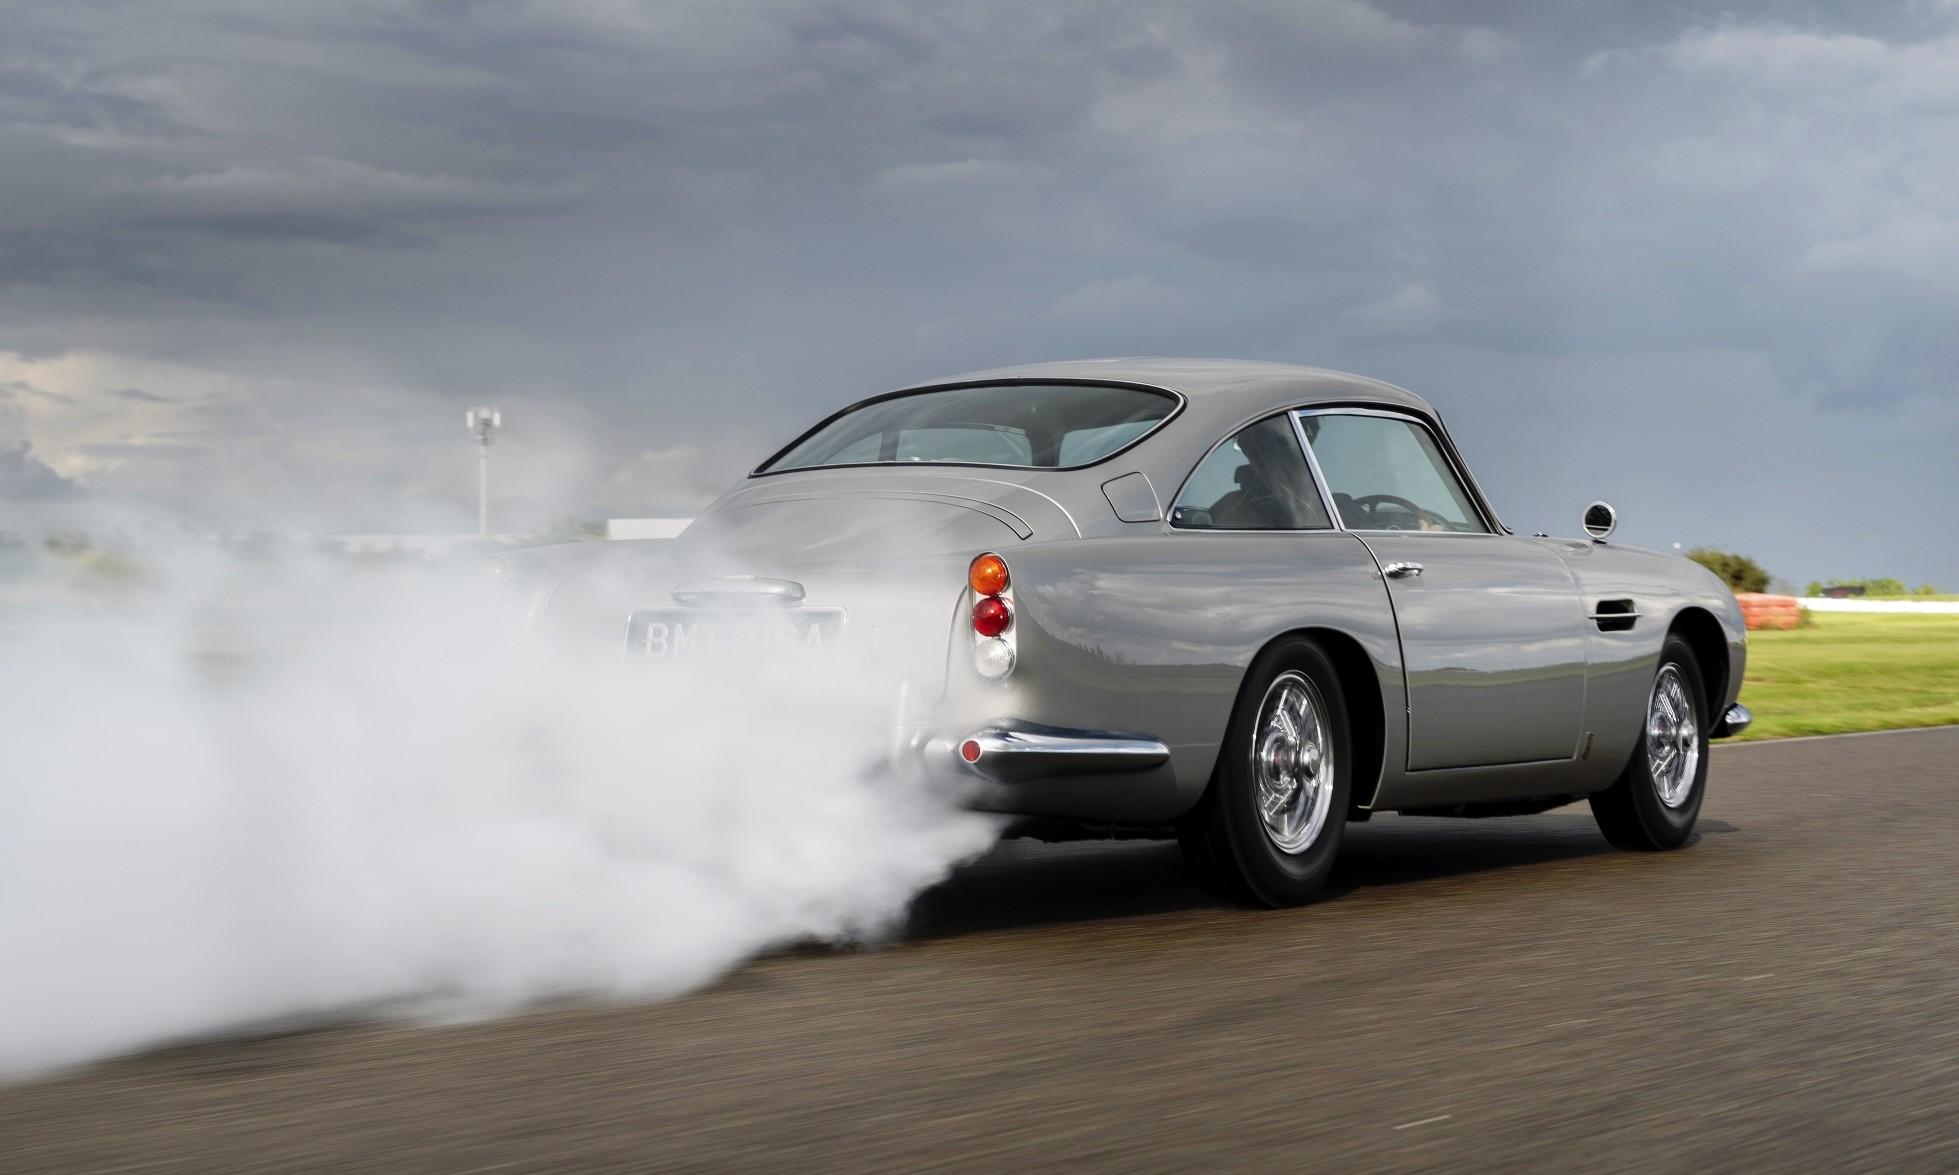 James Bond Aston Martin DB5 rear